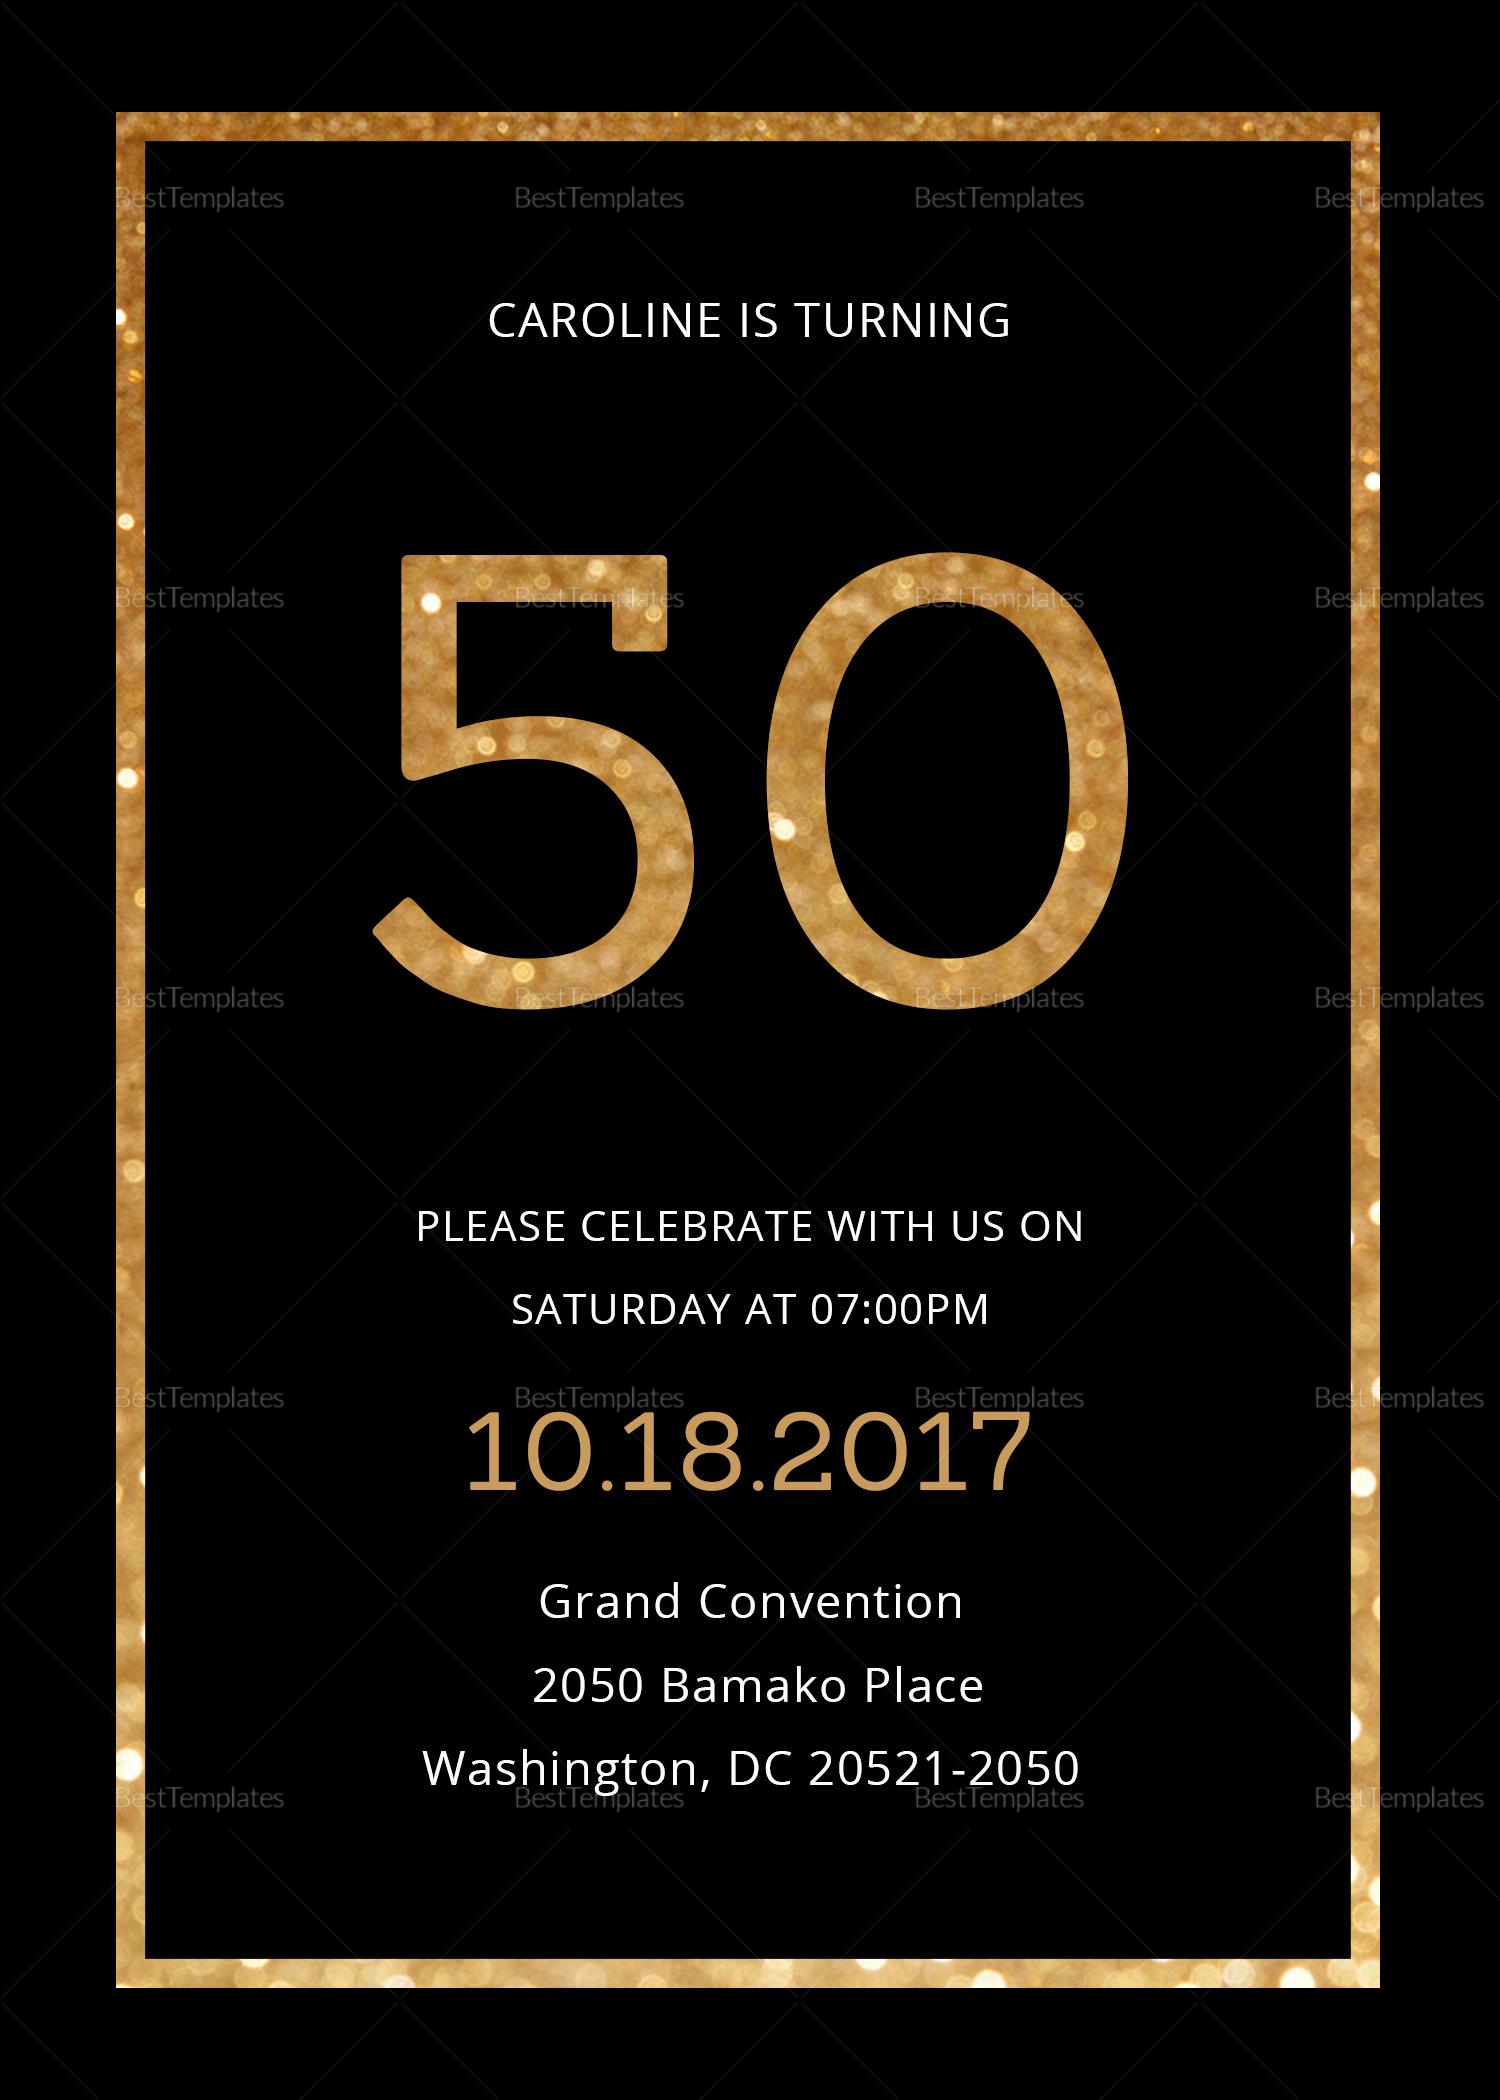 50th Birthday Invitation Template Lovely Elegant Black and Gold 50th Birthday Invitation Design